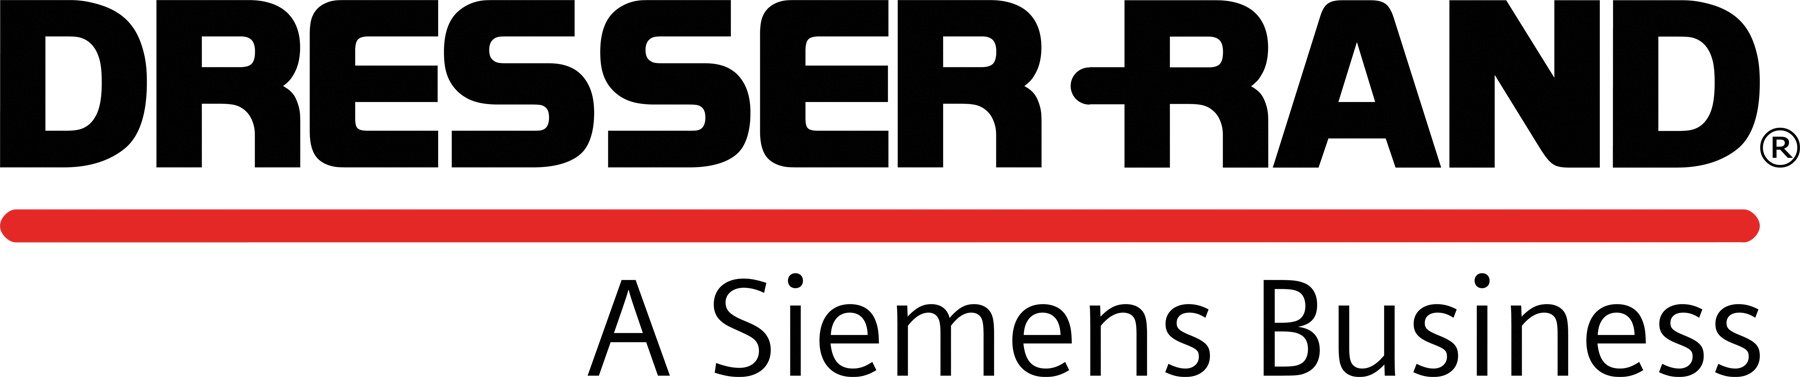 Client Dresser Rand Limited